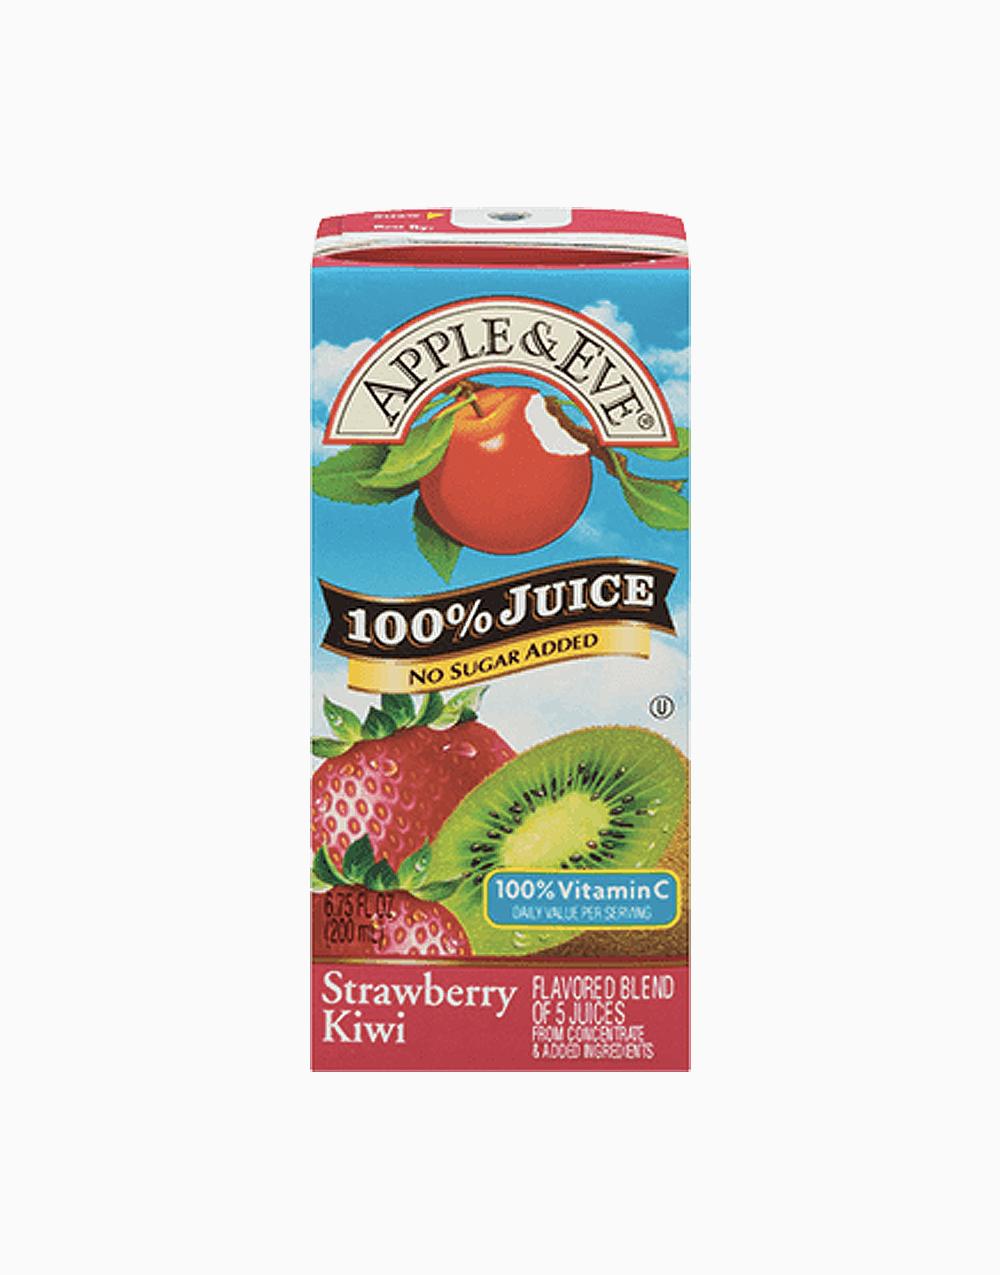 Strawberry & Kiwi Juice (200ml) by Apple & Eve